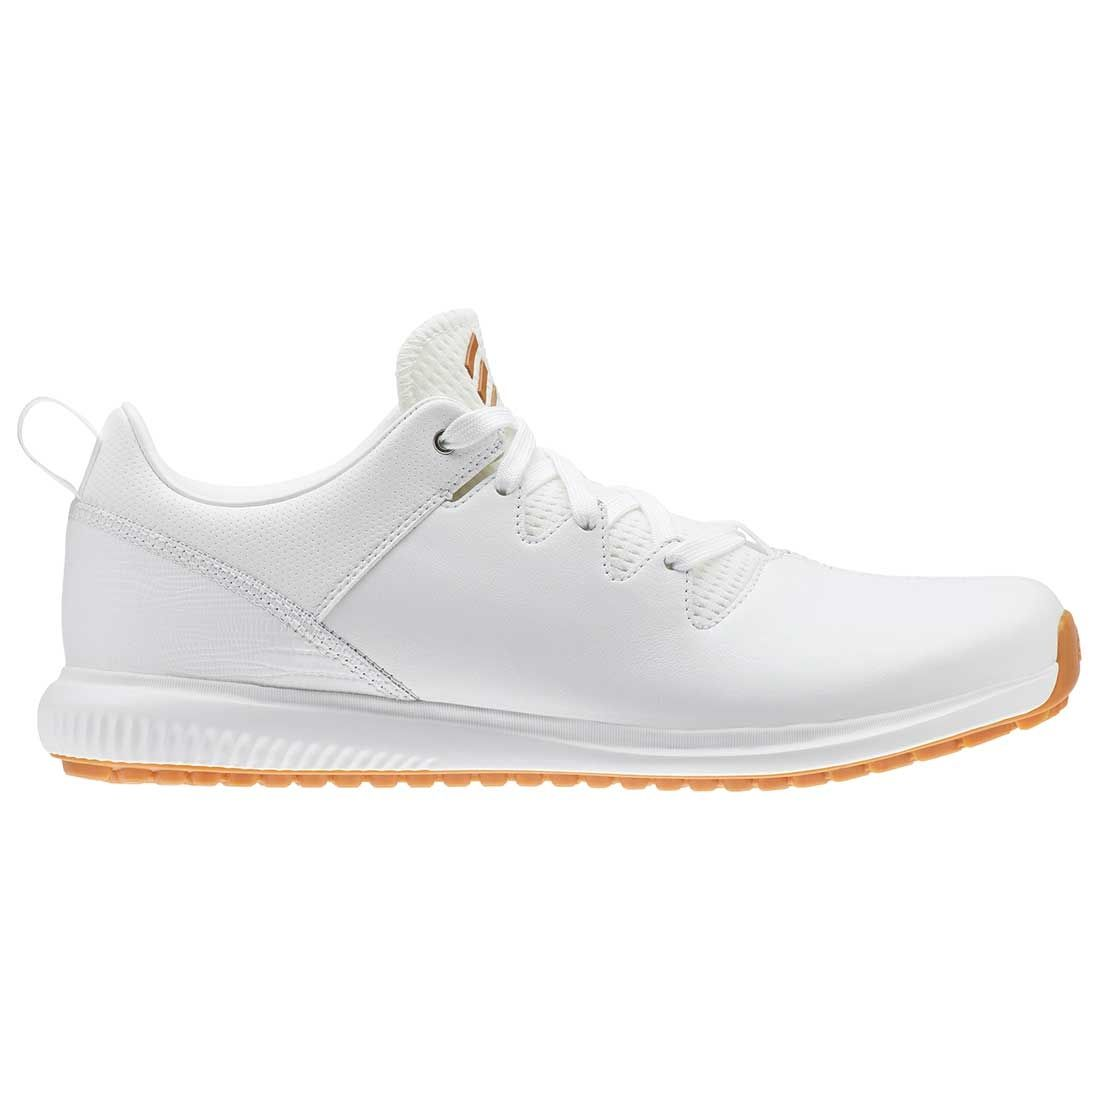 Buy Adidas Adicross PPF Golf Shoes